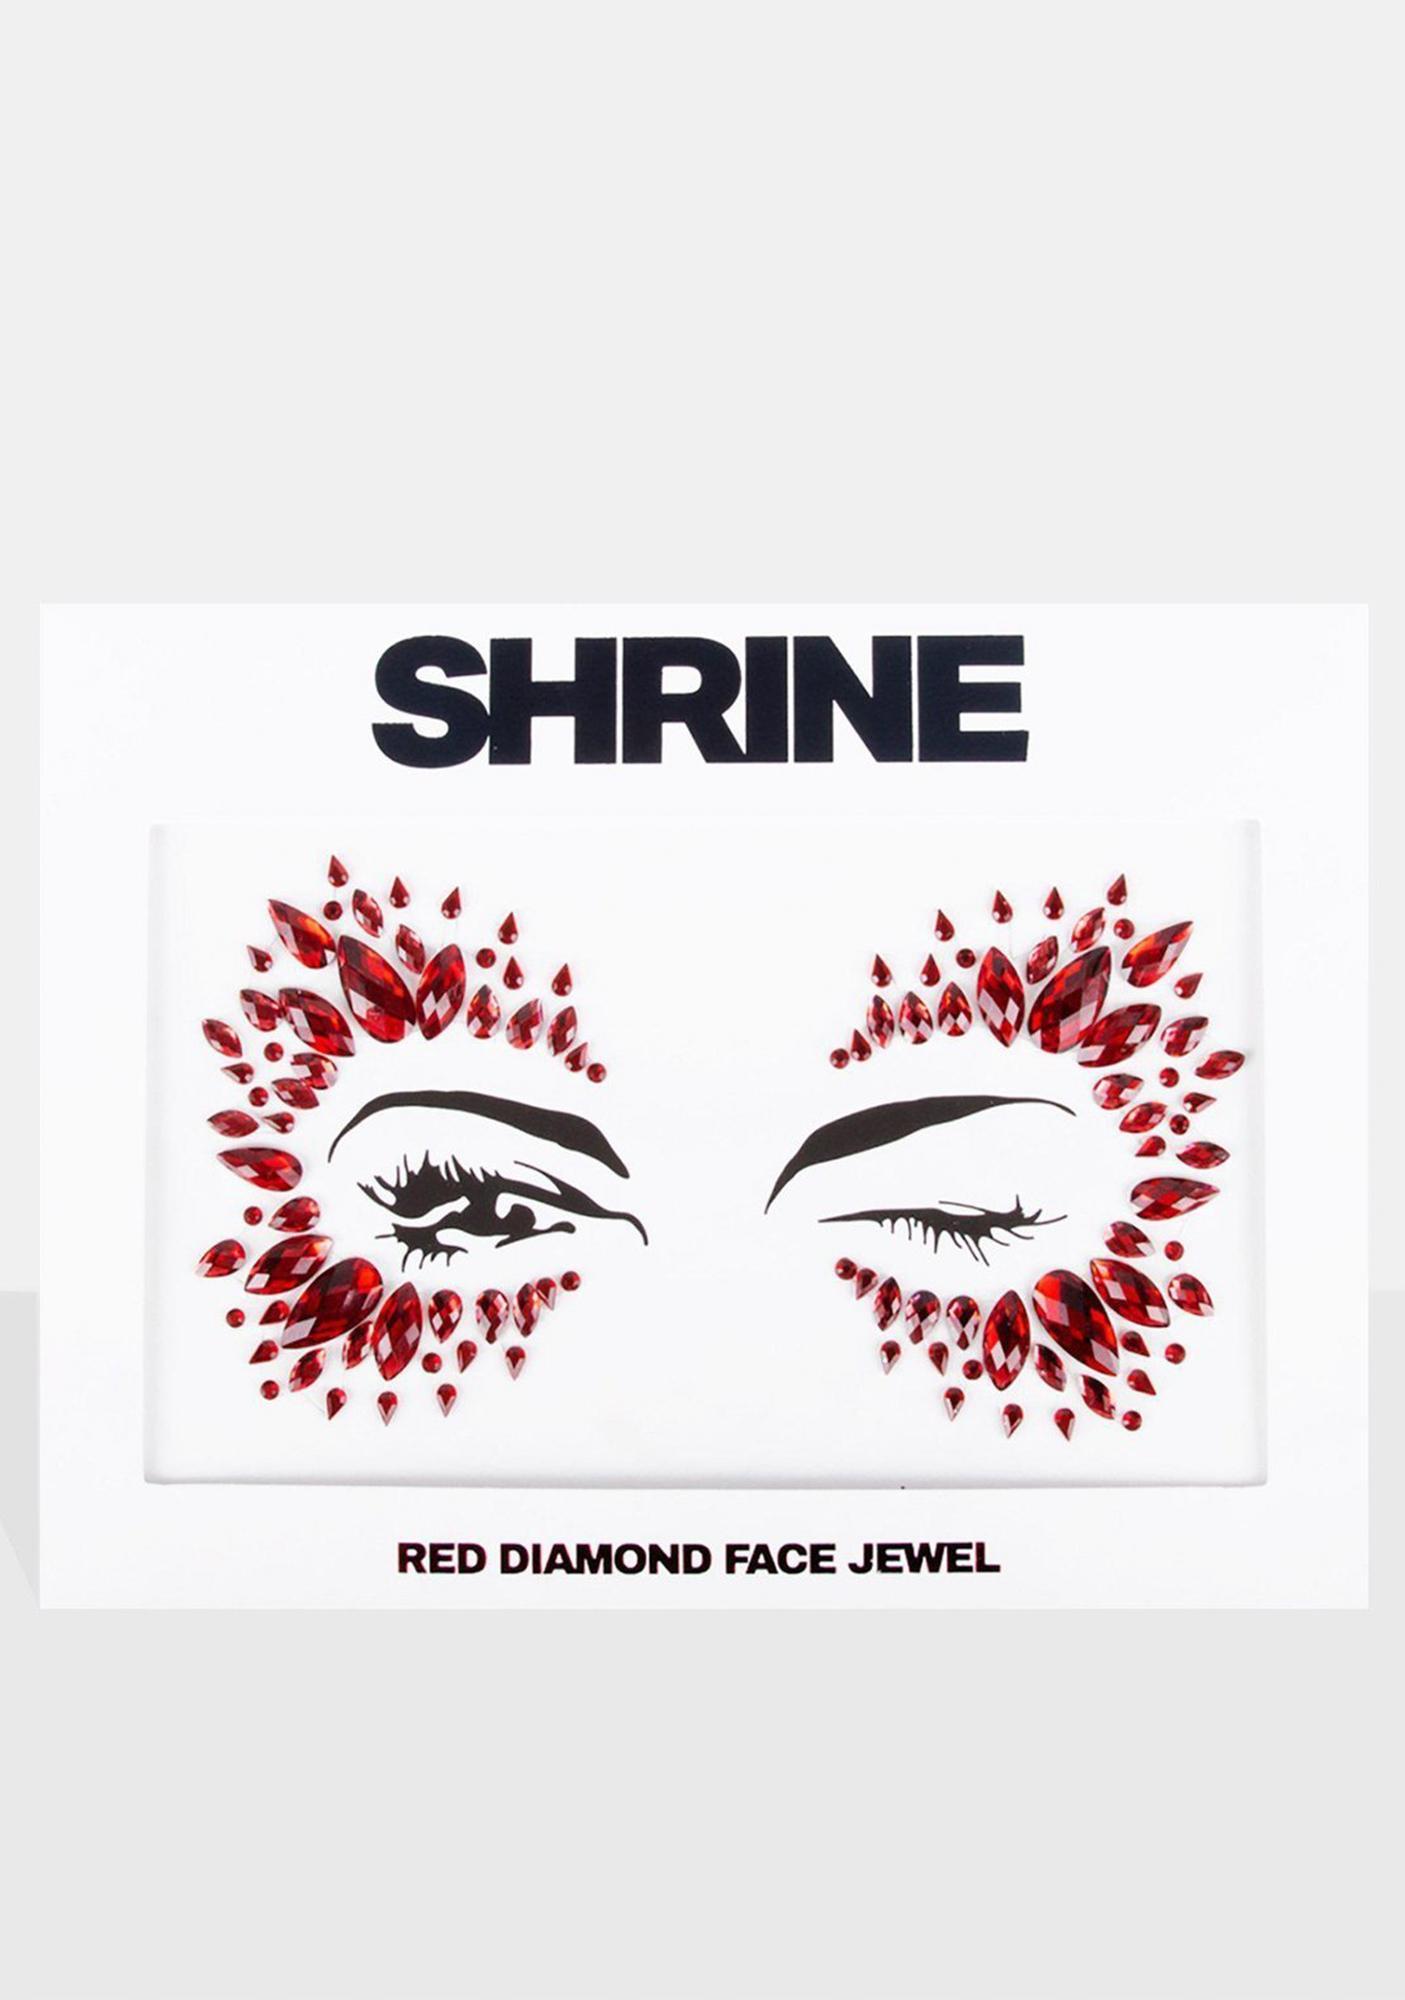 SHRINE Red Diamond Face Jewel